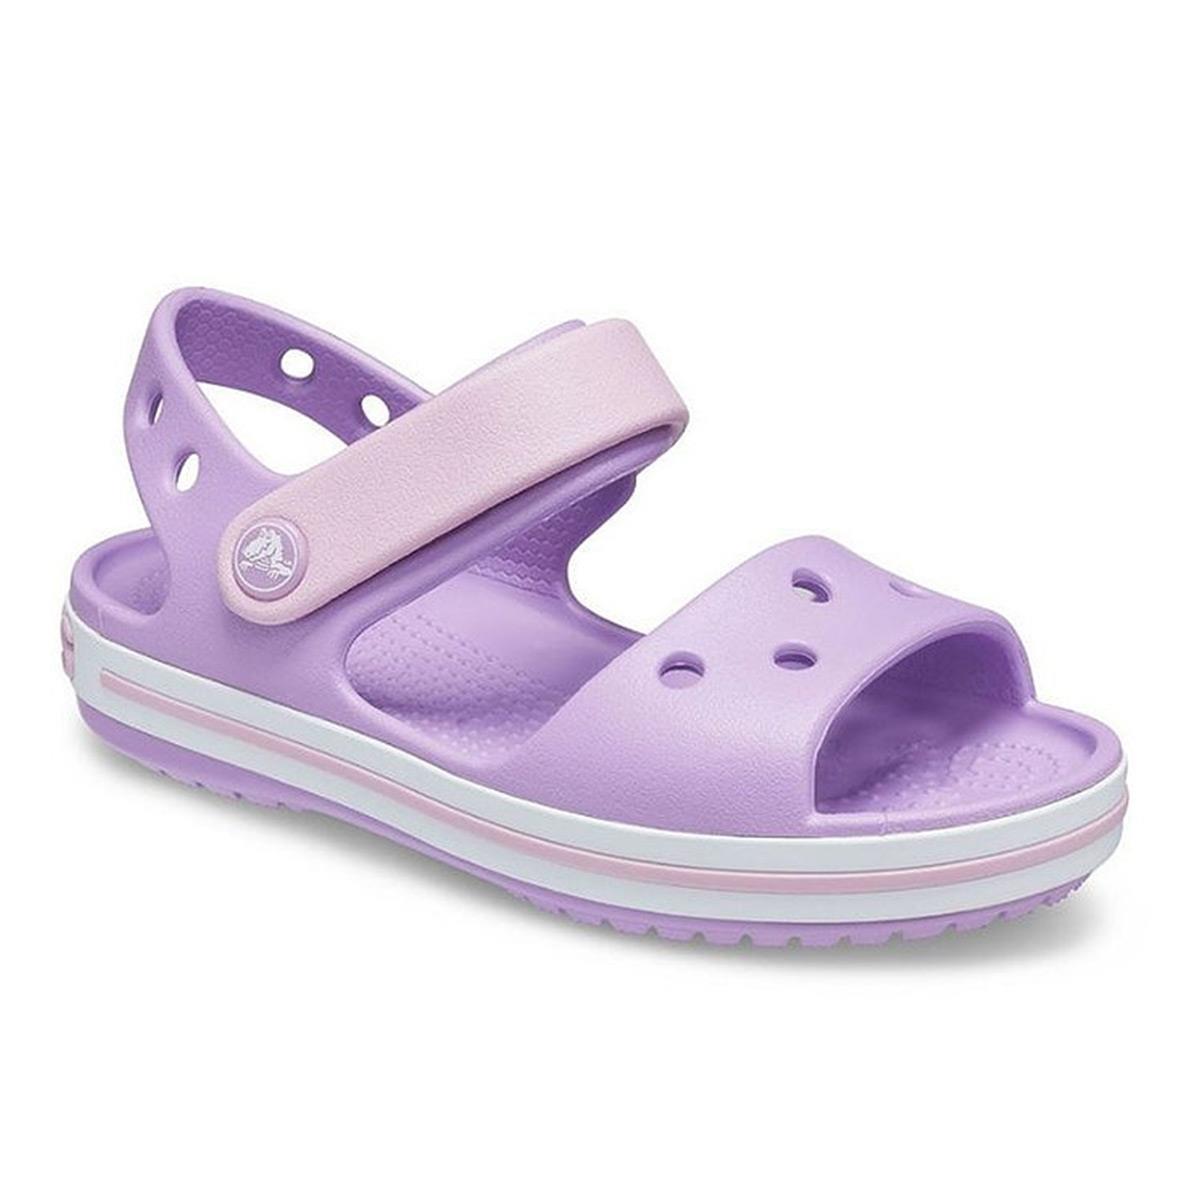 Crocs Crocband Çocuk Sandal CR1162-5PR